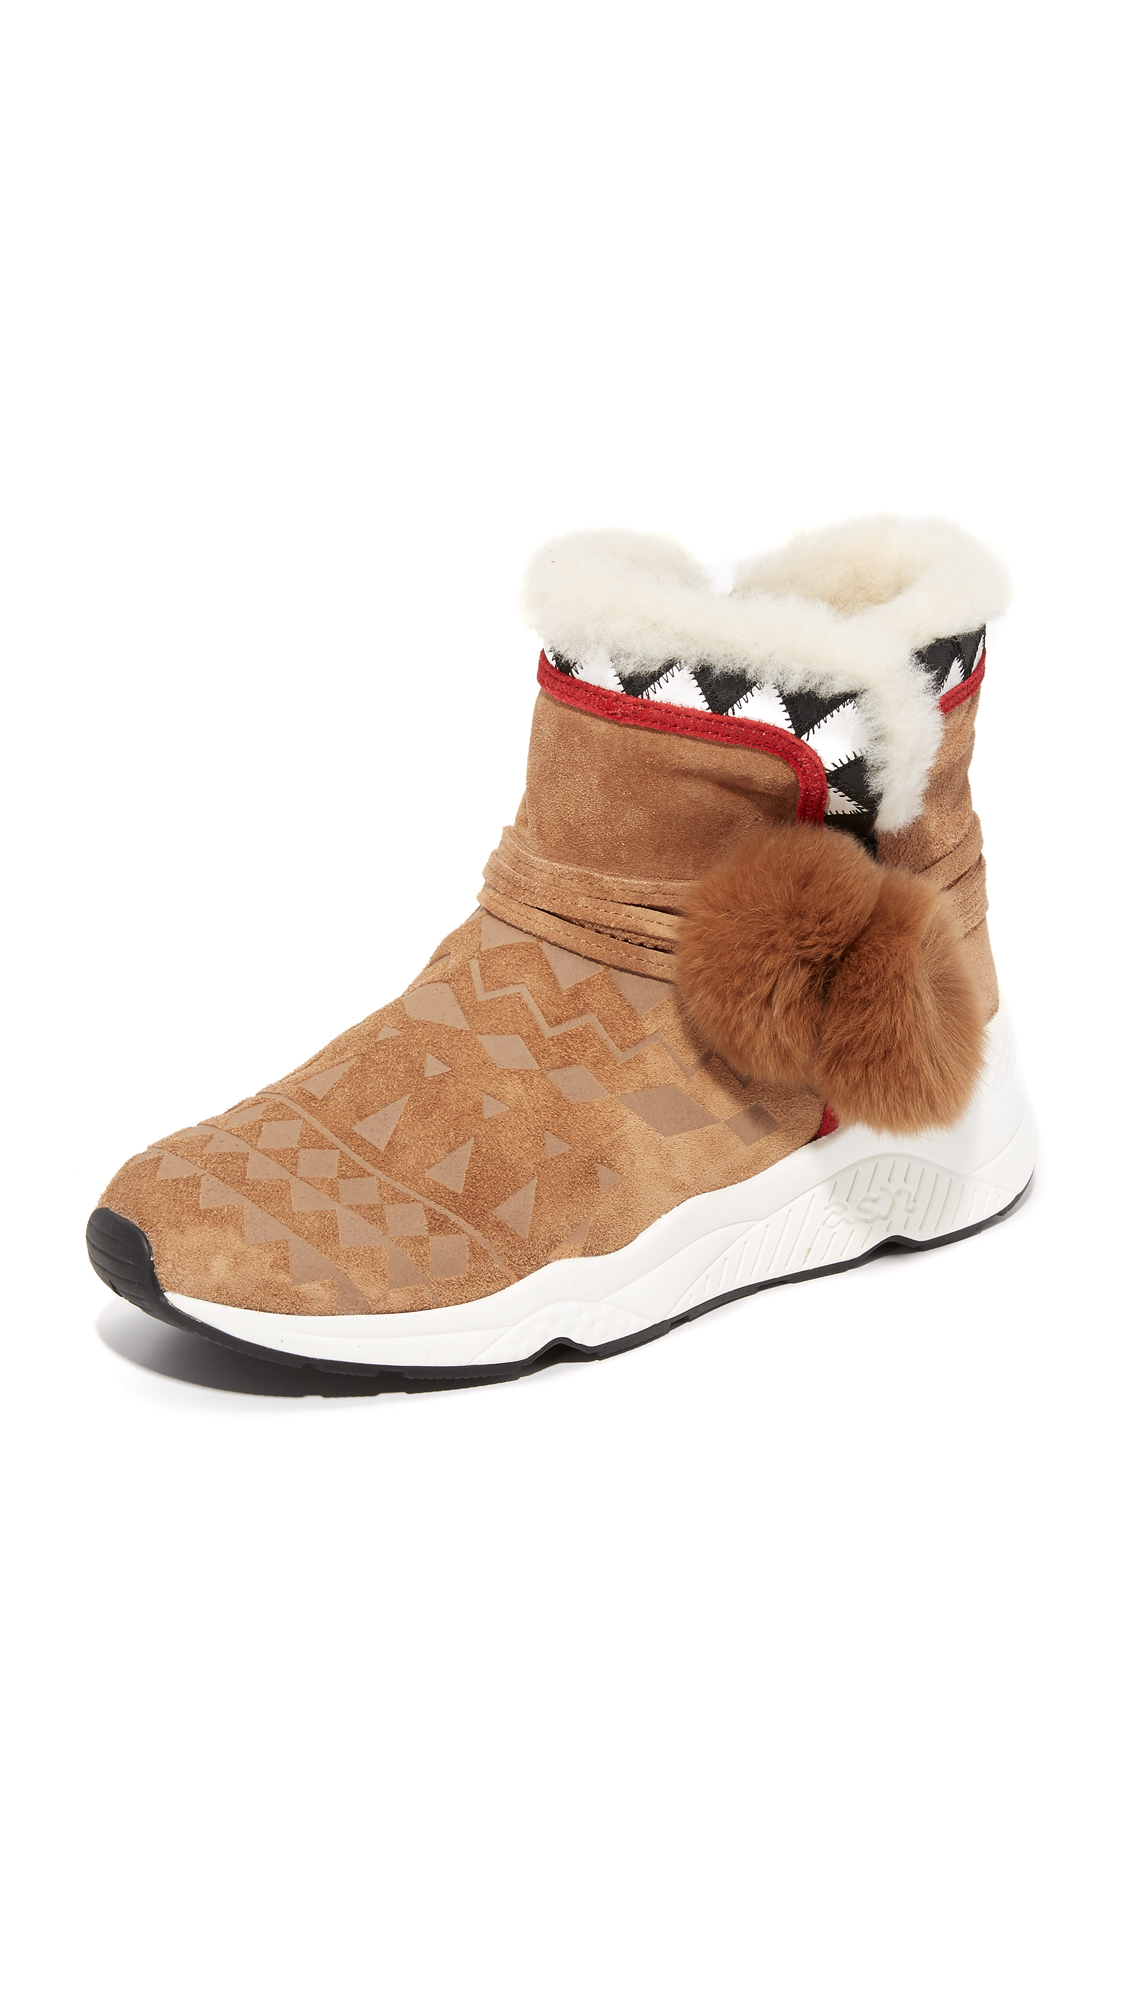 Ash Mongolia Sherpa Booties - Crepe/Black/White/Red